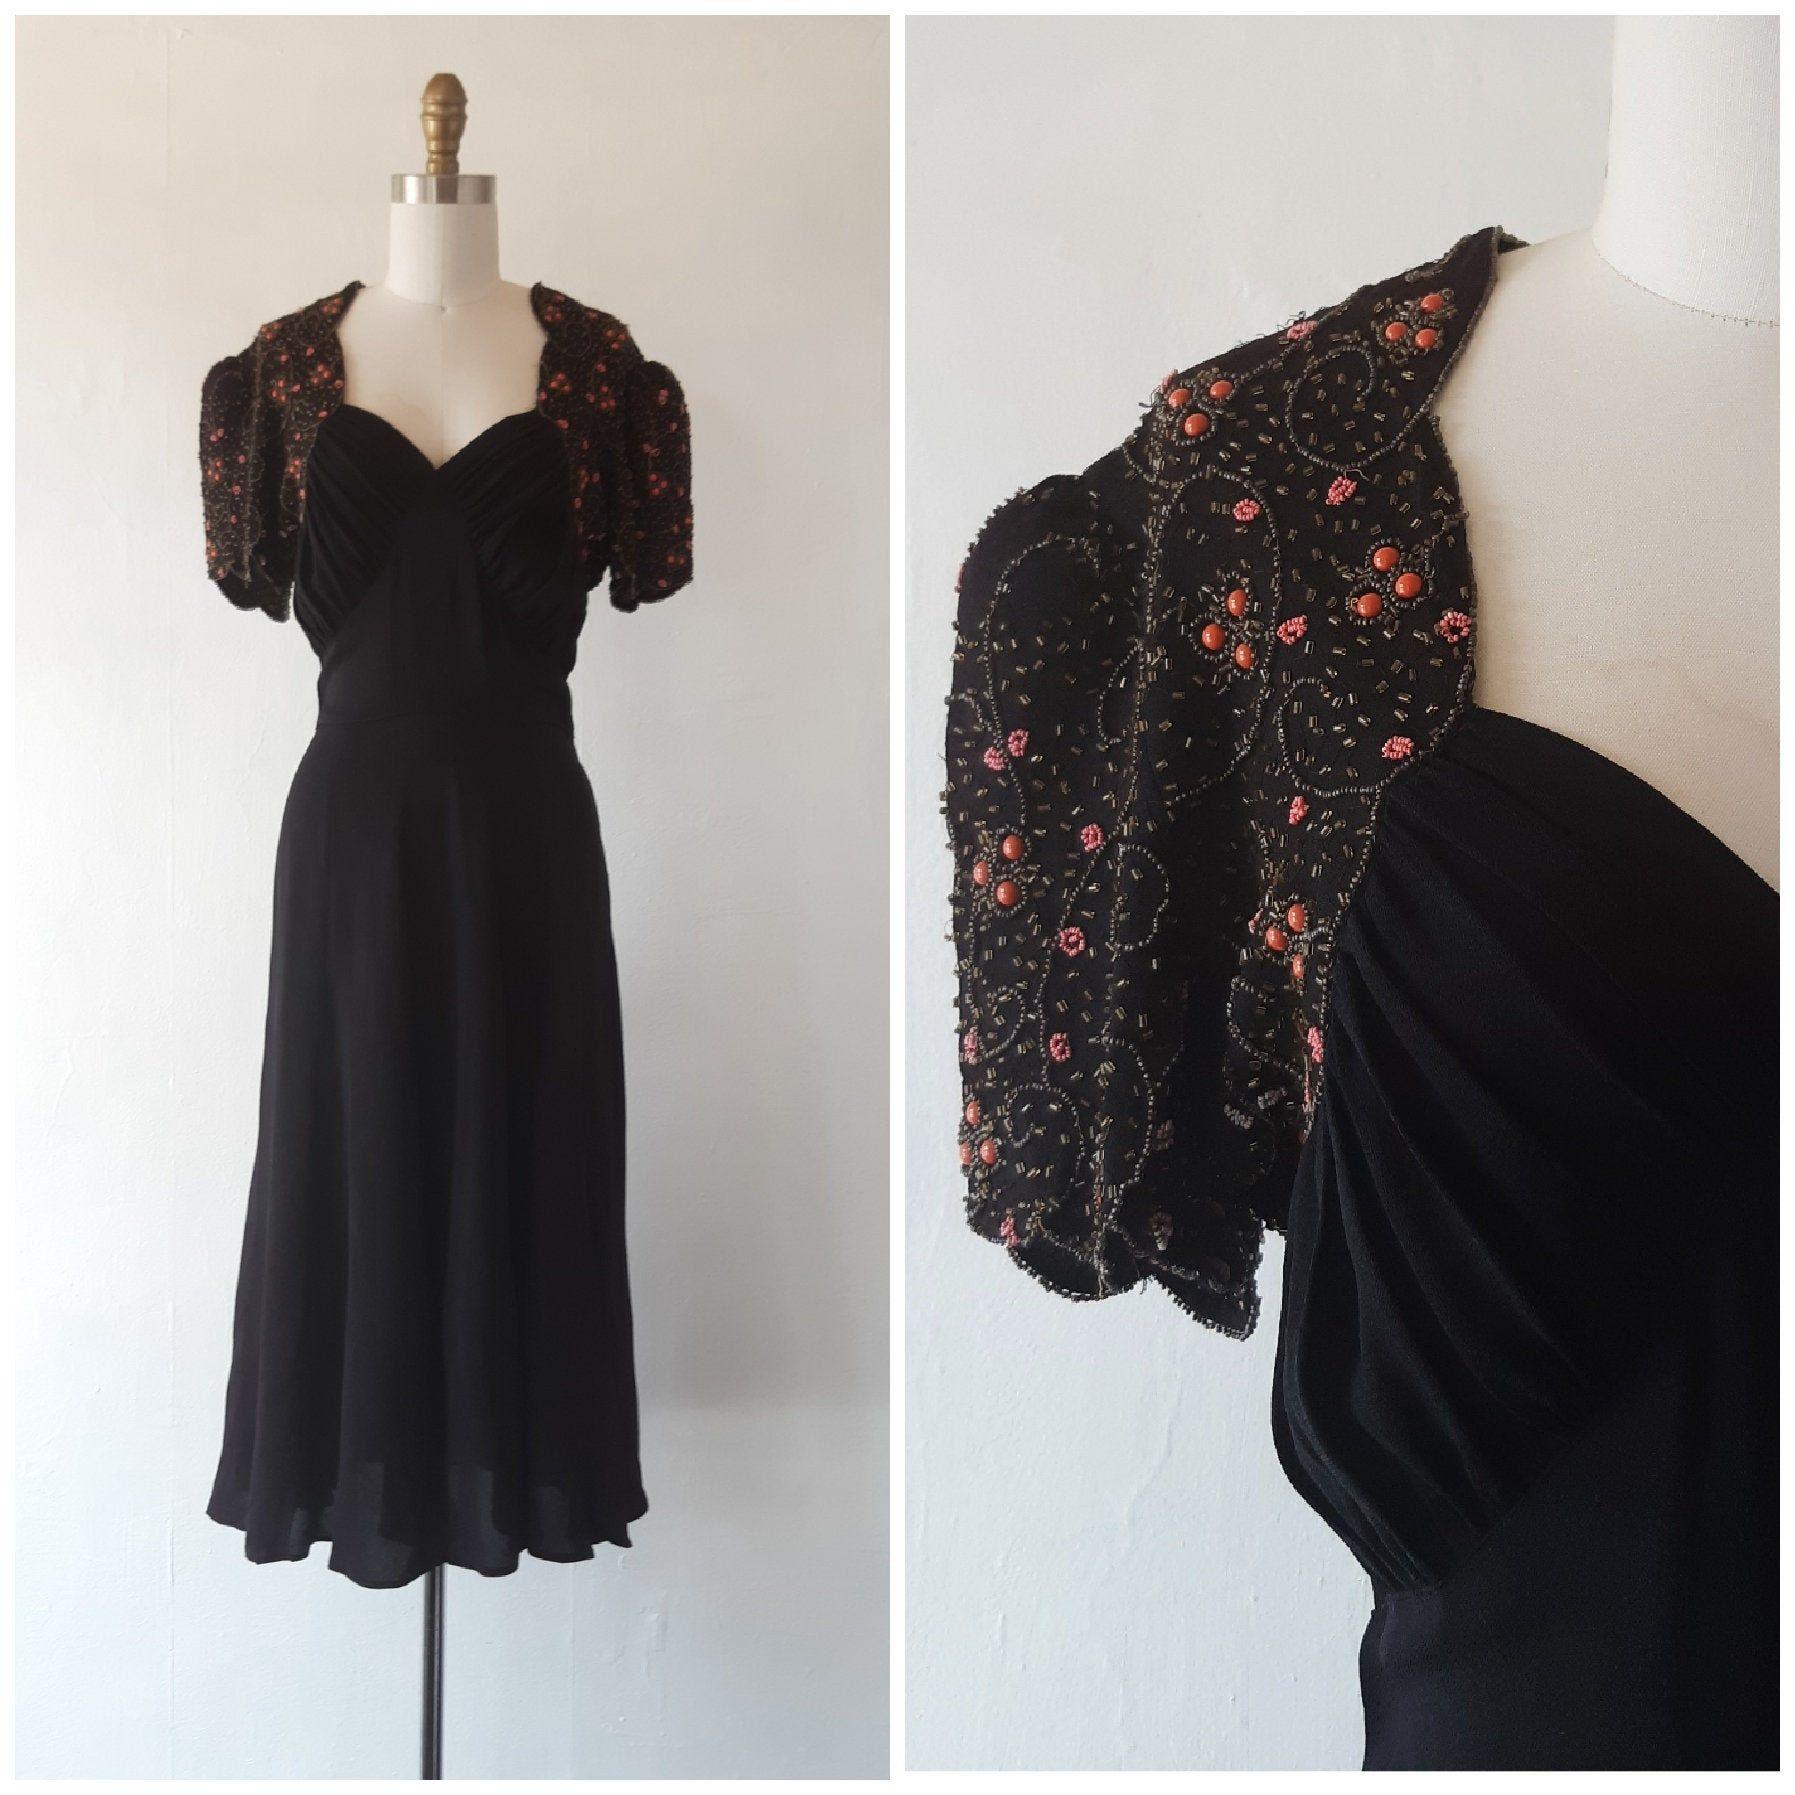 Vintage Black Velvet Dress By Laura Ashley Dresses Black Velvet Dress Xmas Outfit [ 1600 x 1195 Pixel ]